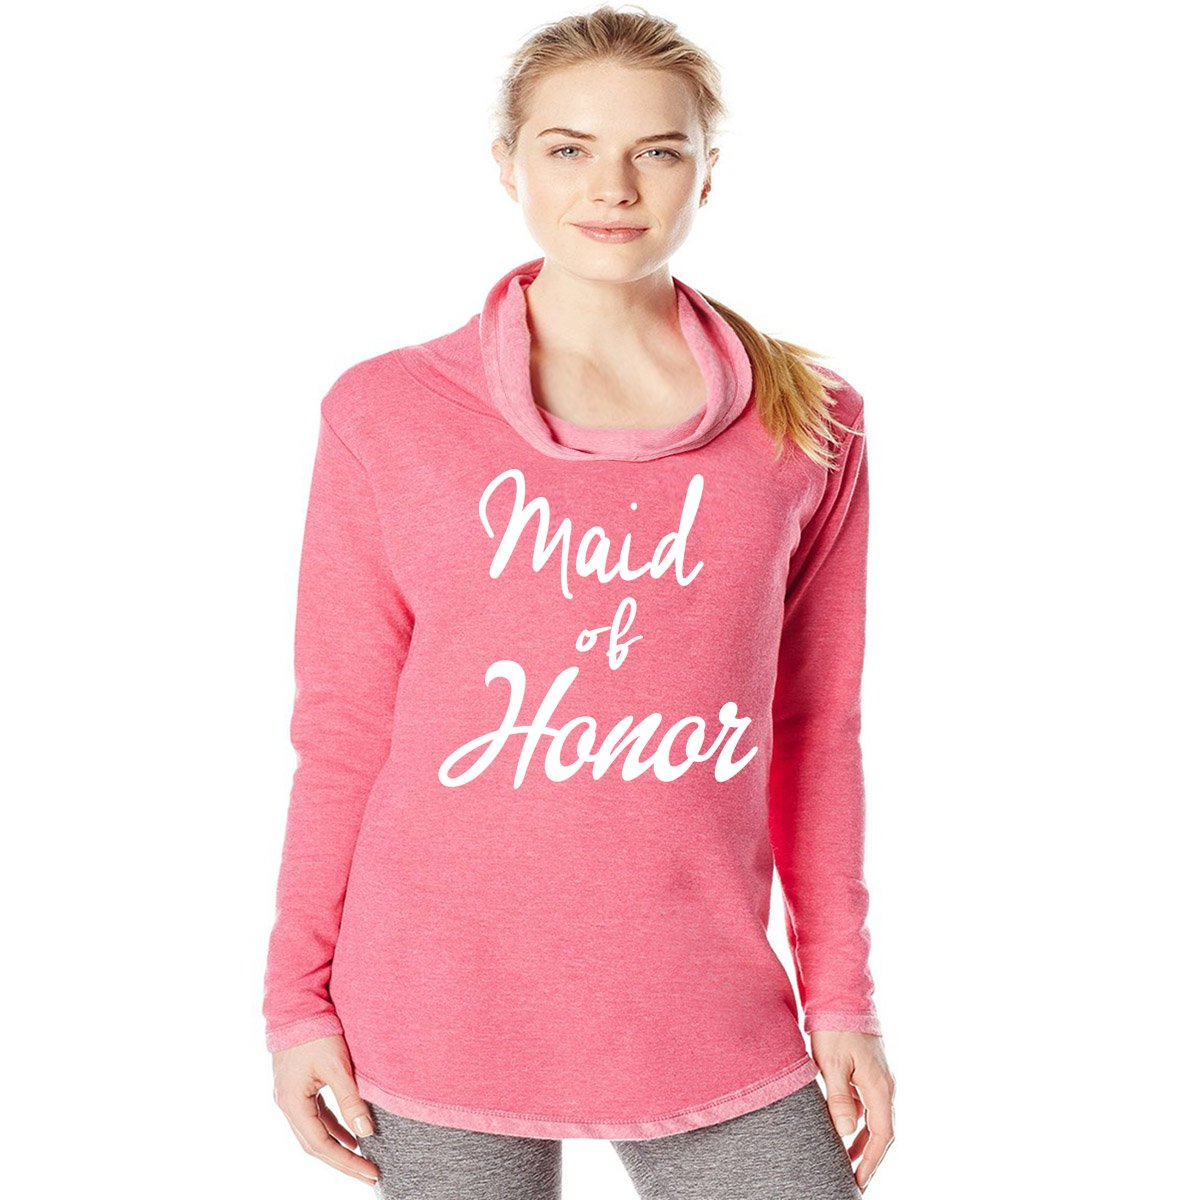 Super Soft Cotton Shirt Blend Womens Maid of Honor Sweatshirt Queen Apparel